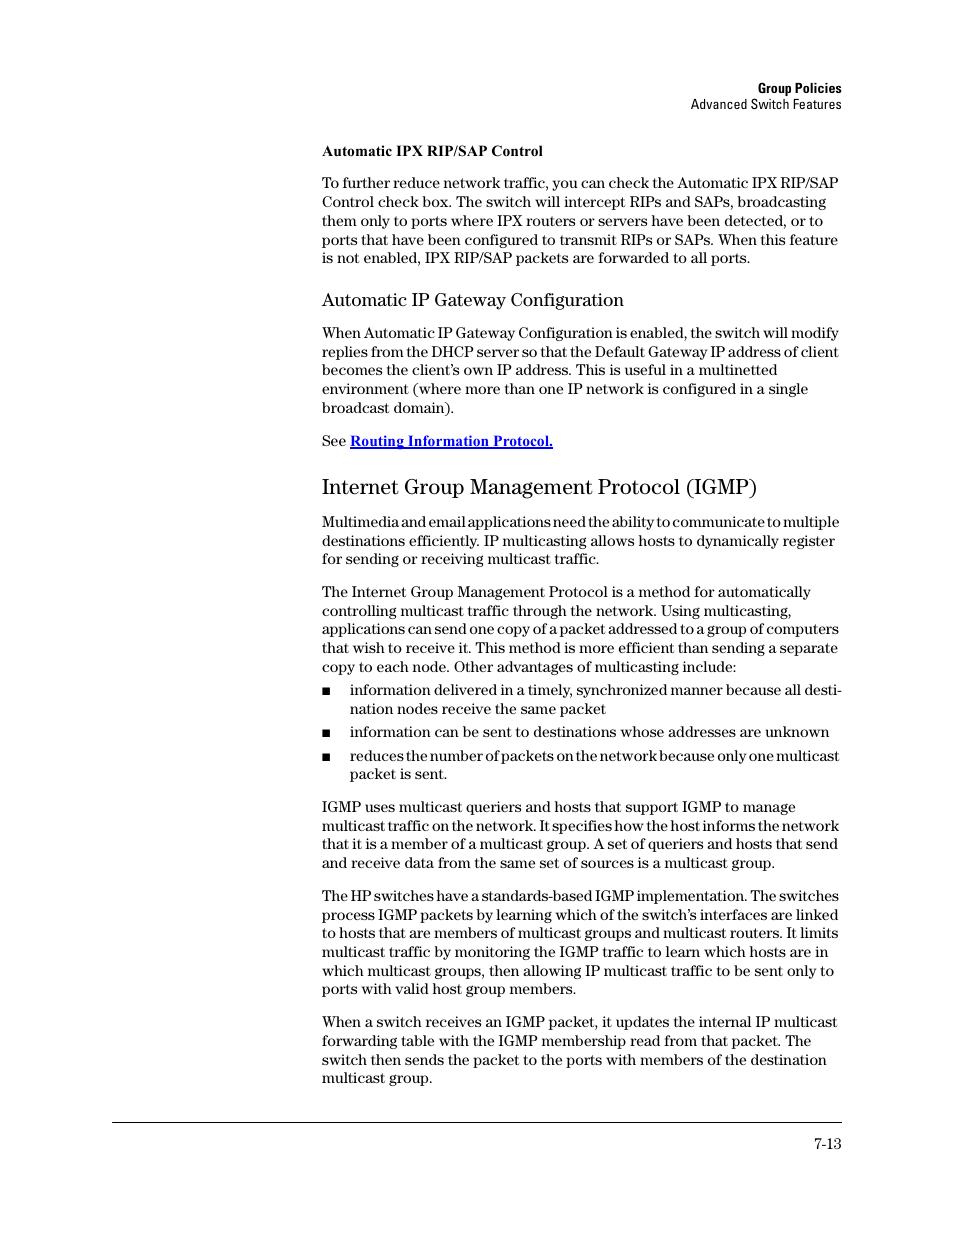 Internet group management protocol (igmp), Internet group